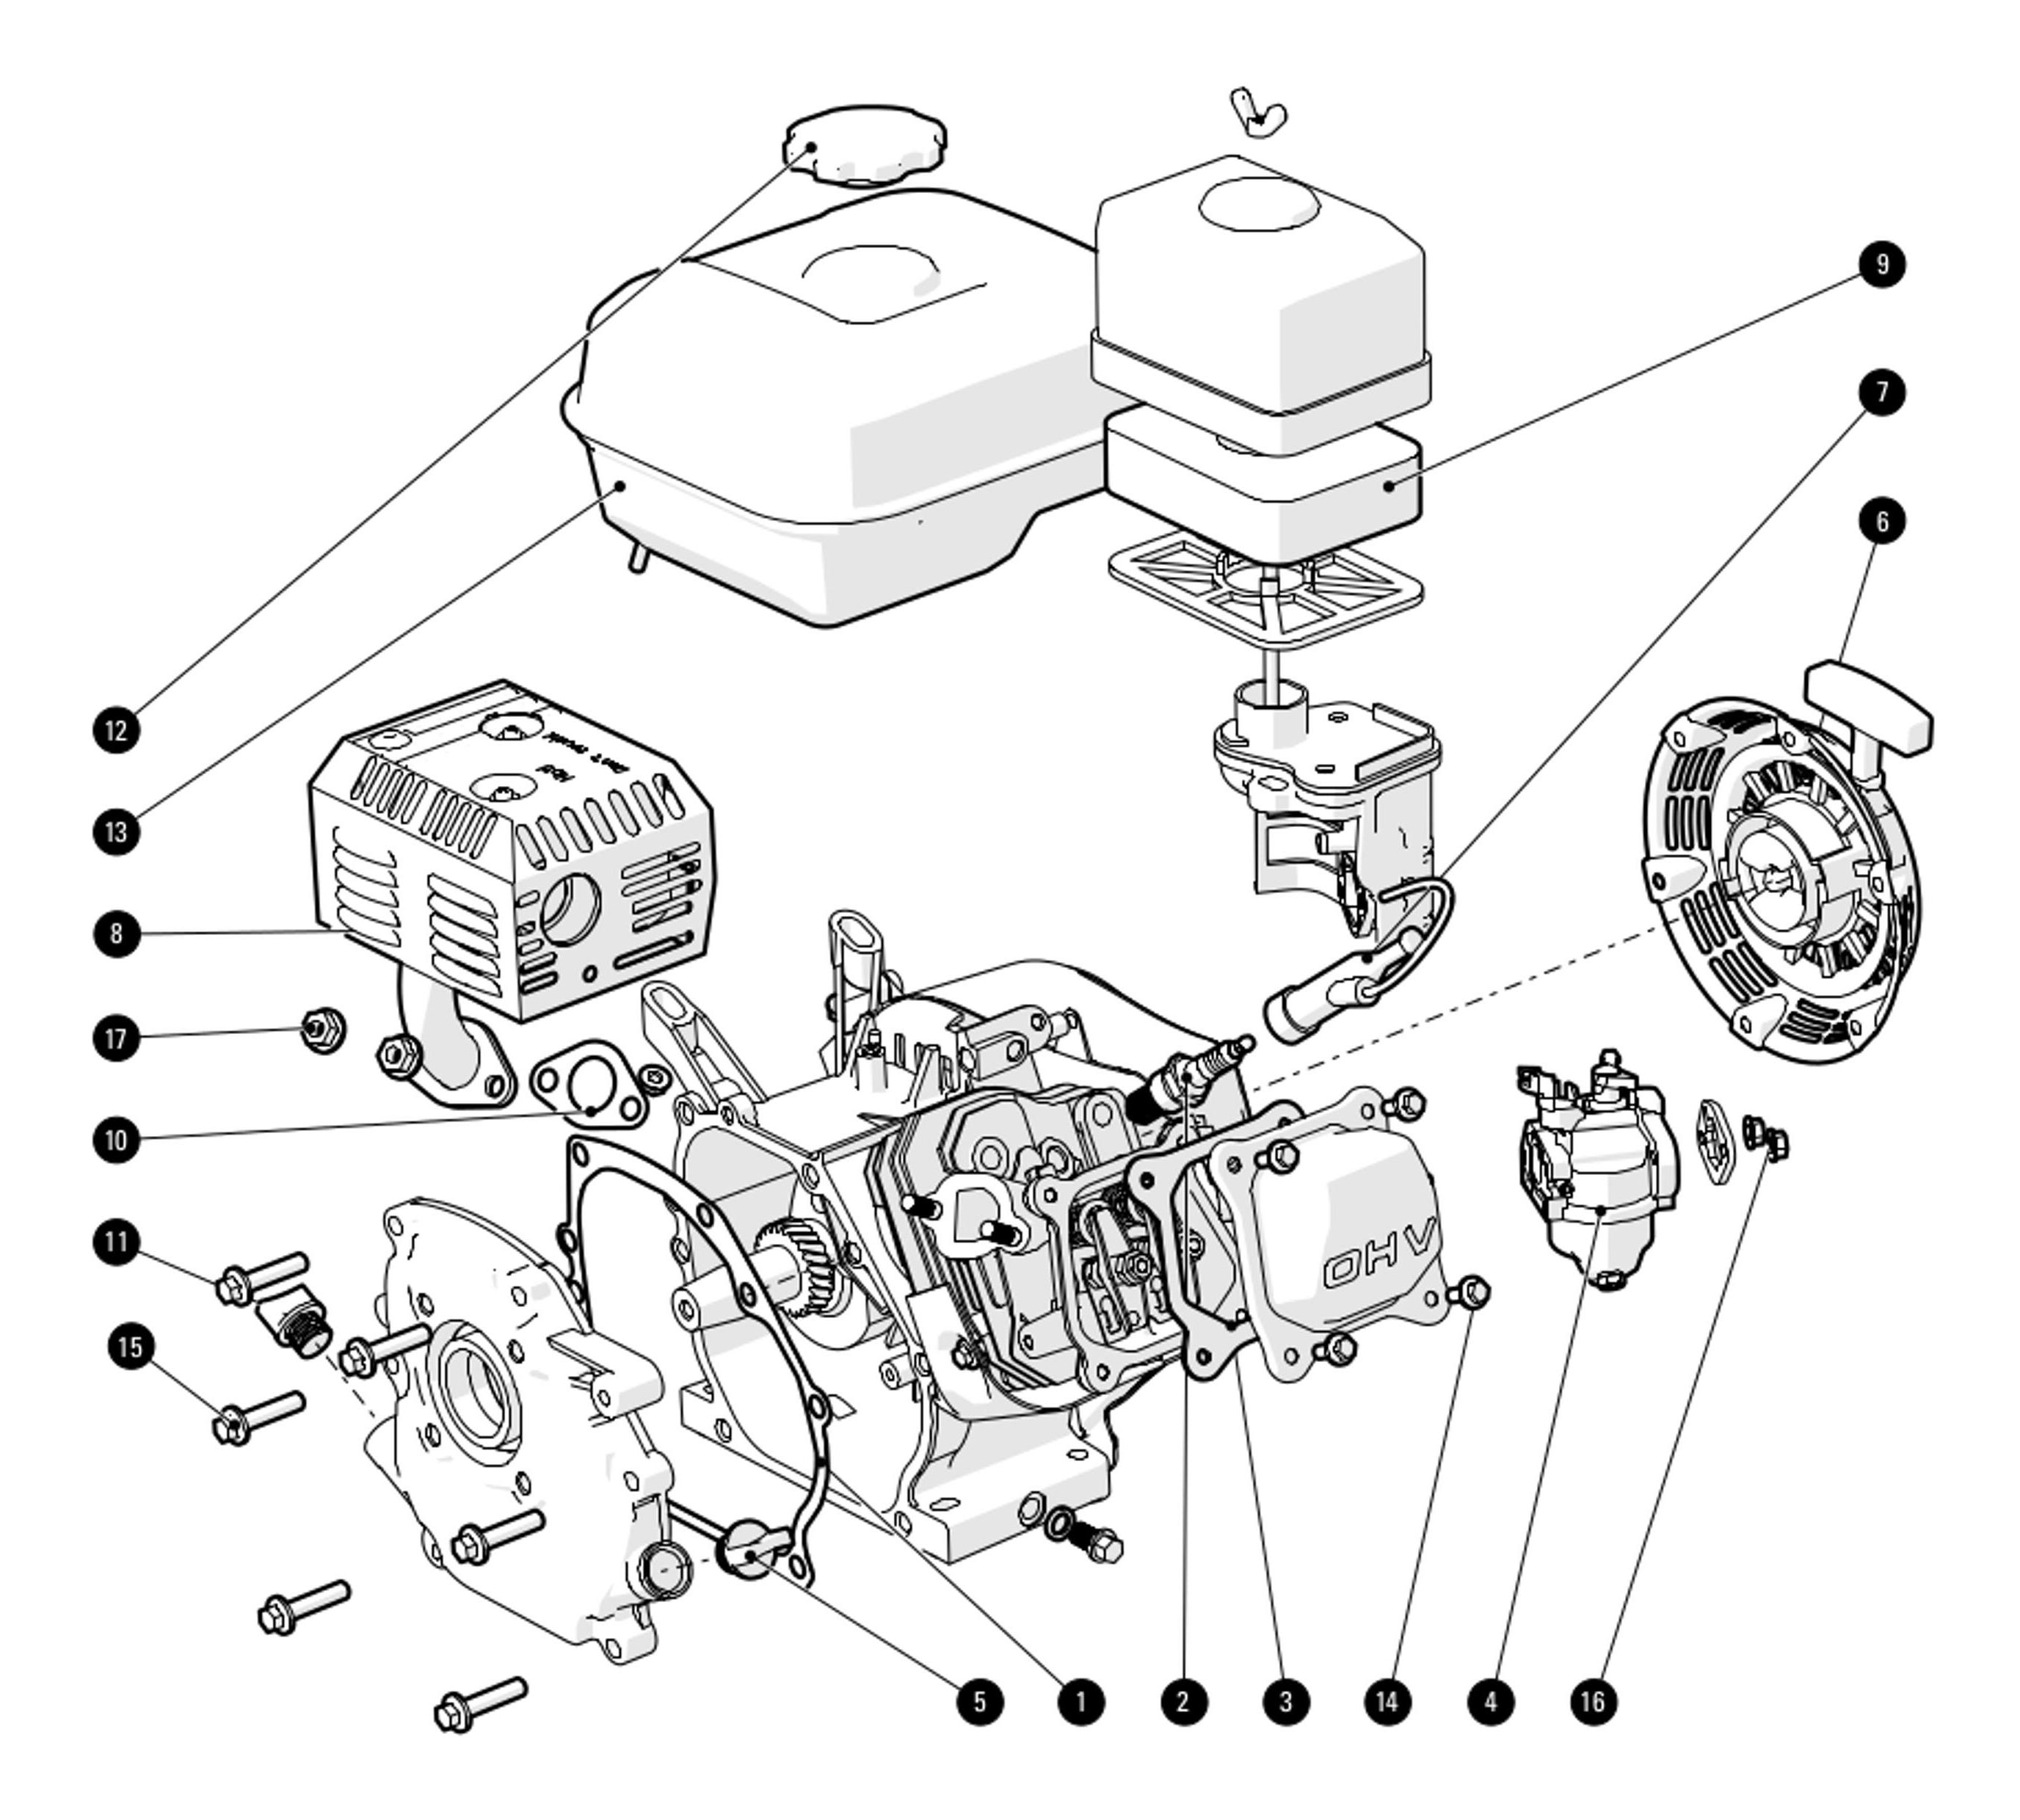 DZ_5835] Mack Mp7 Engine Wiring Diagram Schematic Wiring | Volvo Mp7 Engine Head Diagram |  | Epsy Lectu Piot Simij Magn Xempag Xortanet Peted Remca Exxlu Spon Cajos  Omit Greas Benkeme Mohammedshrine Librar Wiring 101